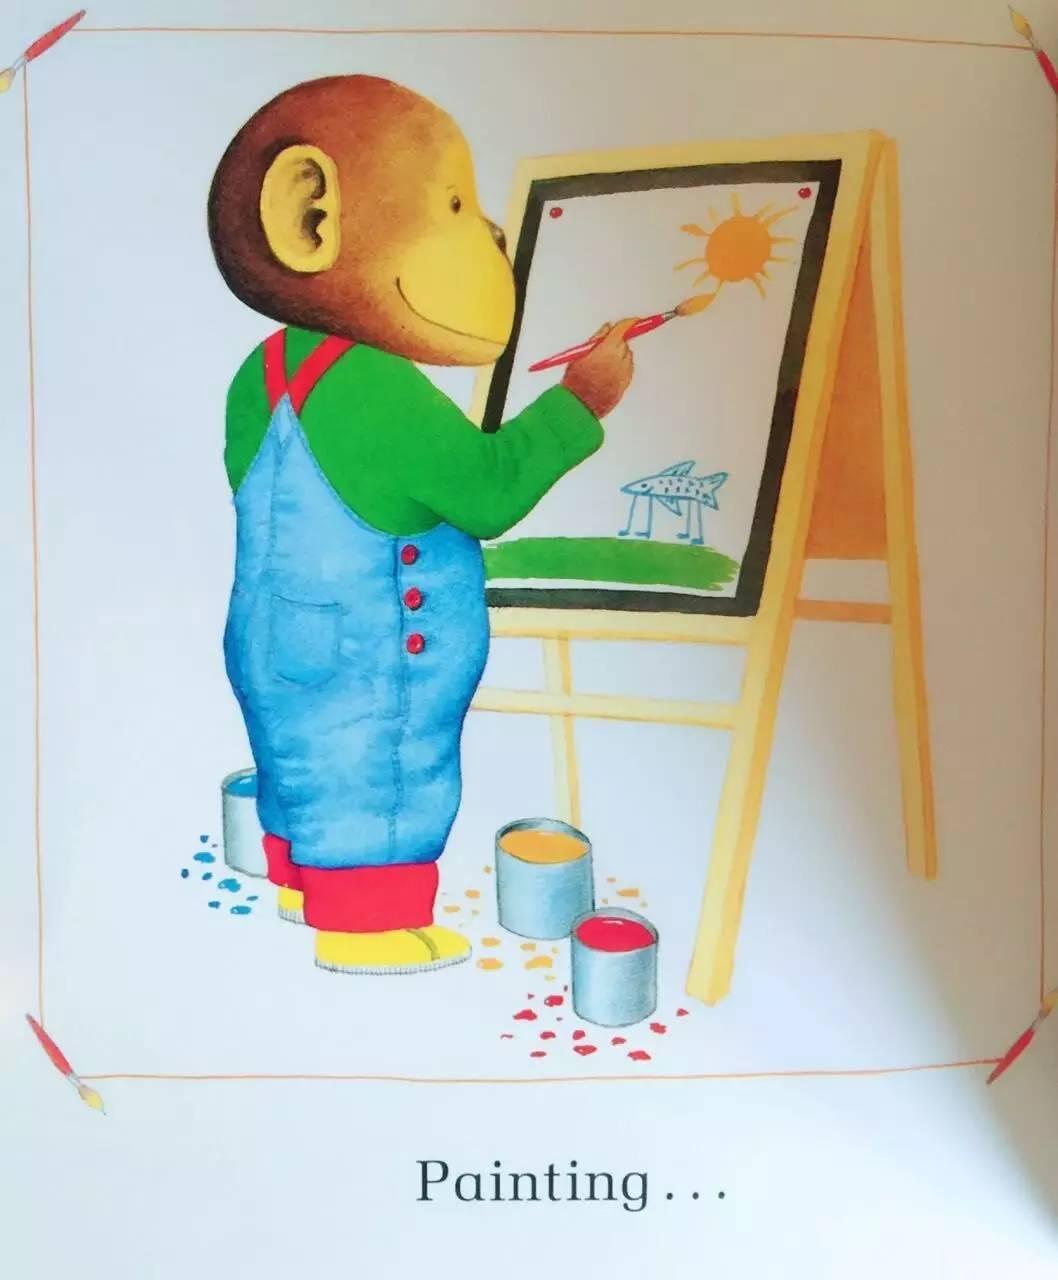 Things I Like 我喜欢的一切 -第3张图片-58绘本网-专注儿童绘本批发销售。